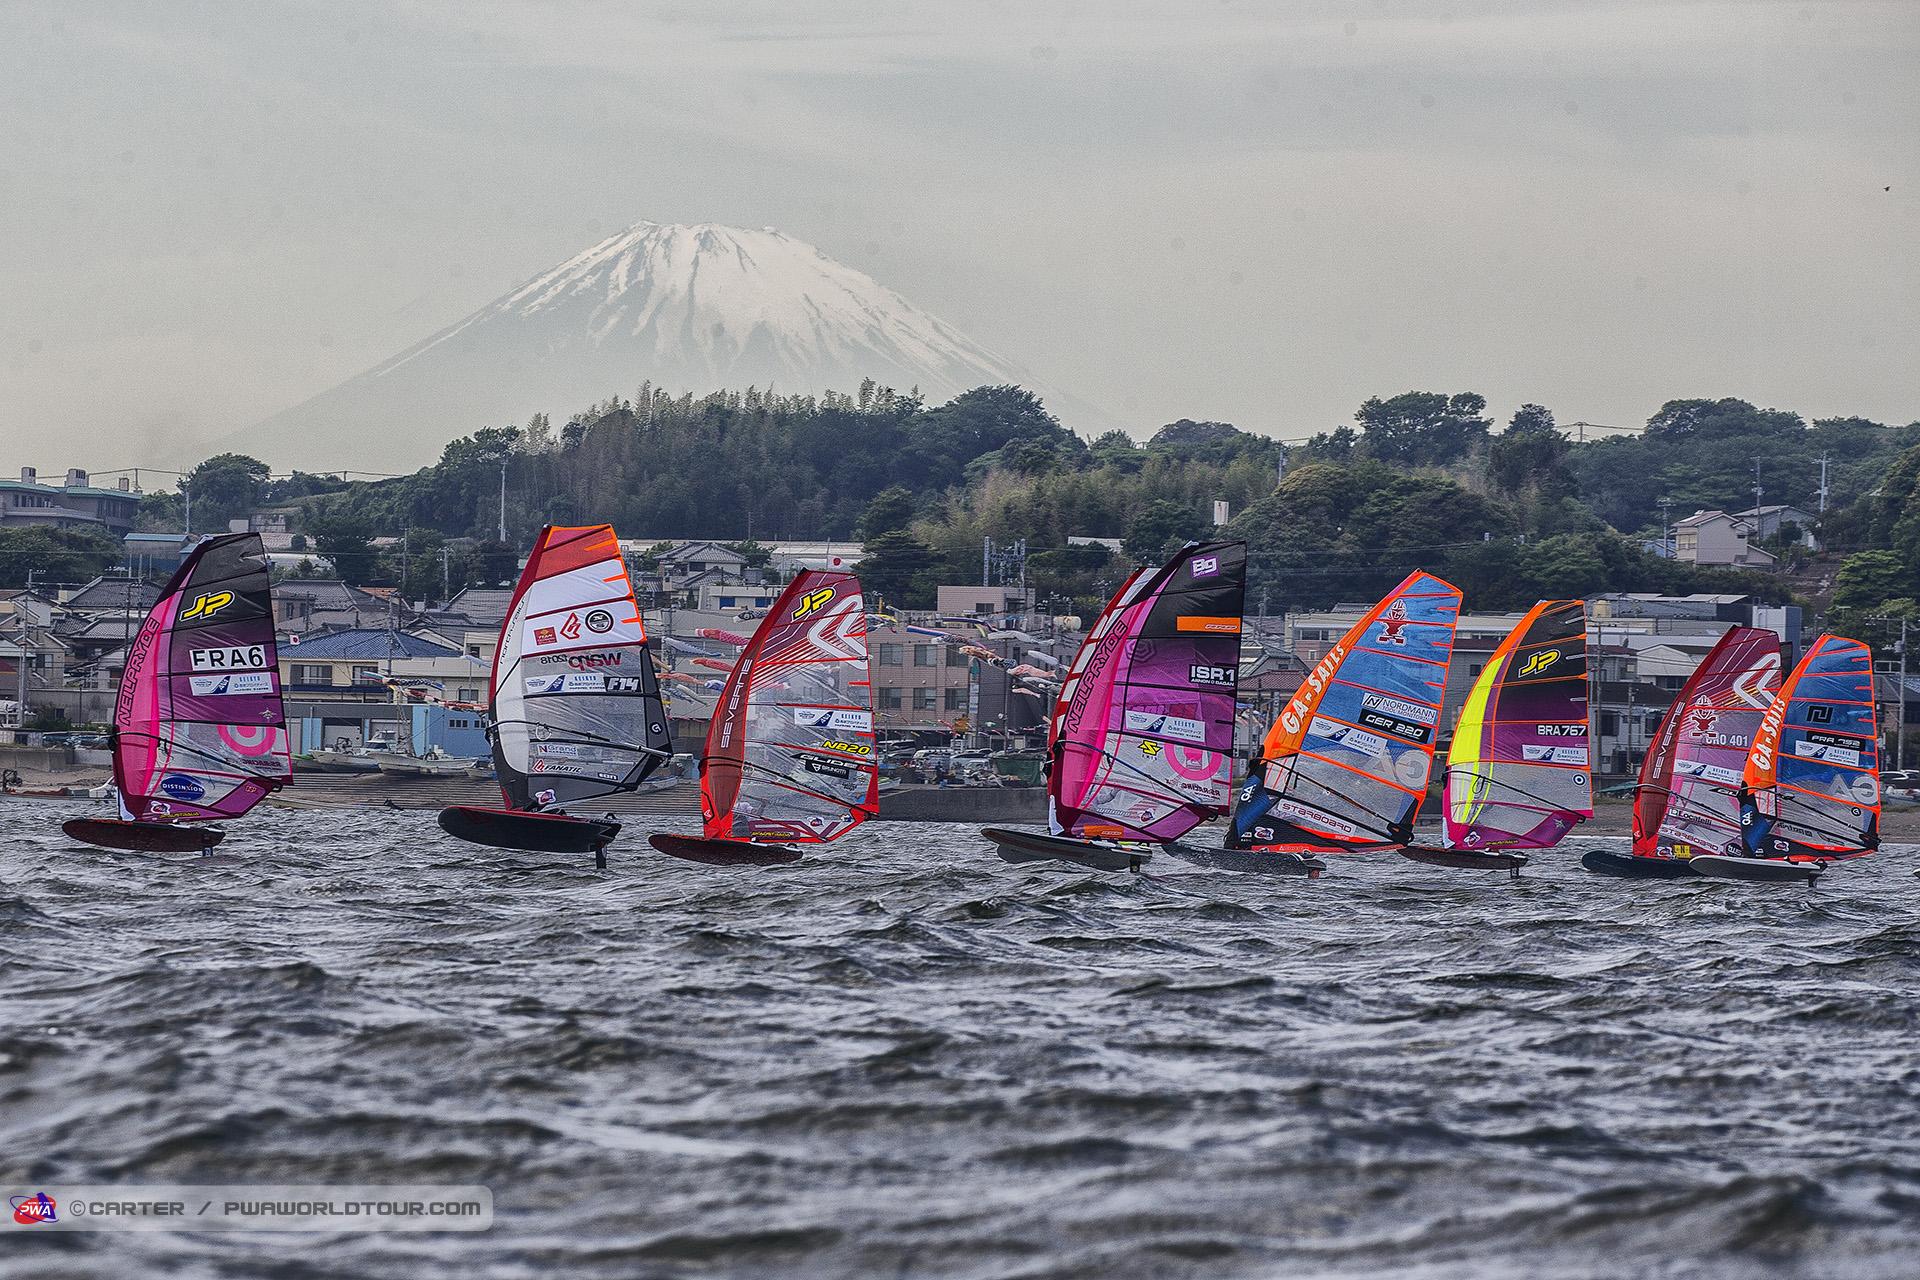 JP18_fl_Mount_Fuji_looms.jpg